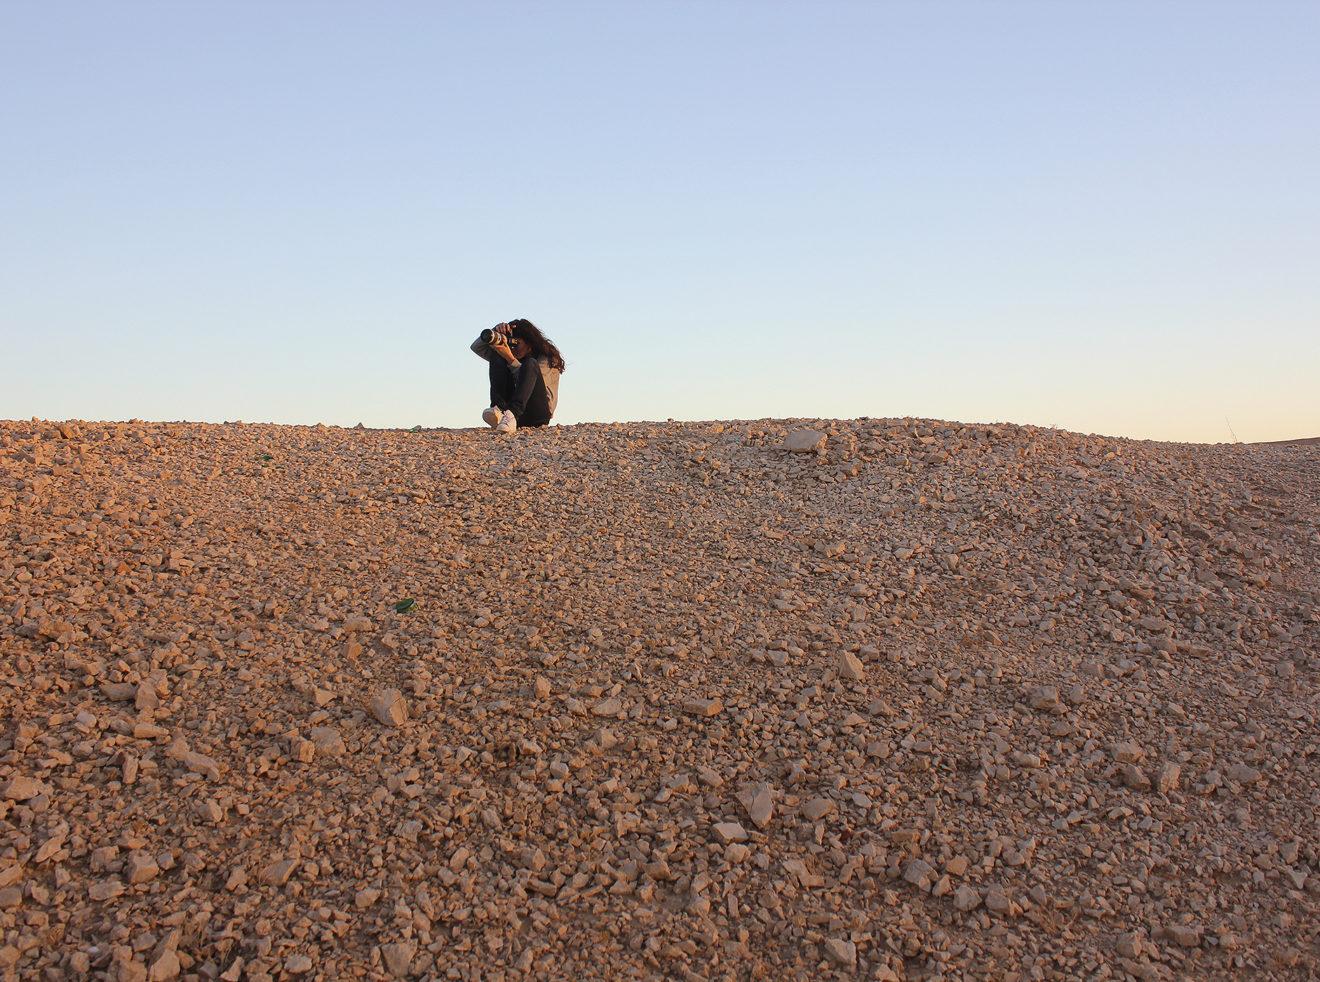 Ana Dias shooting in the Judean Desert, Israel